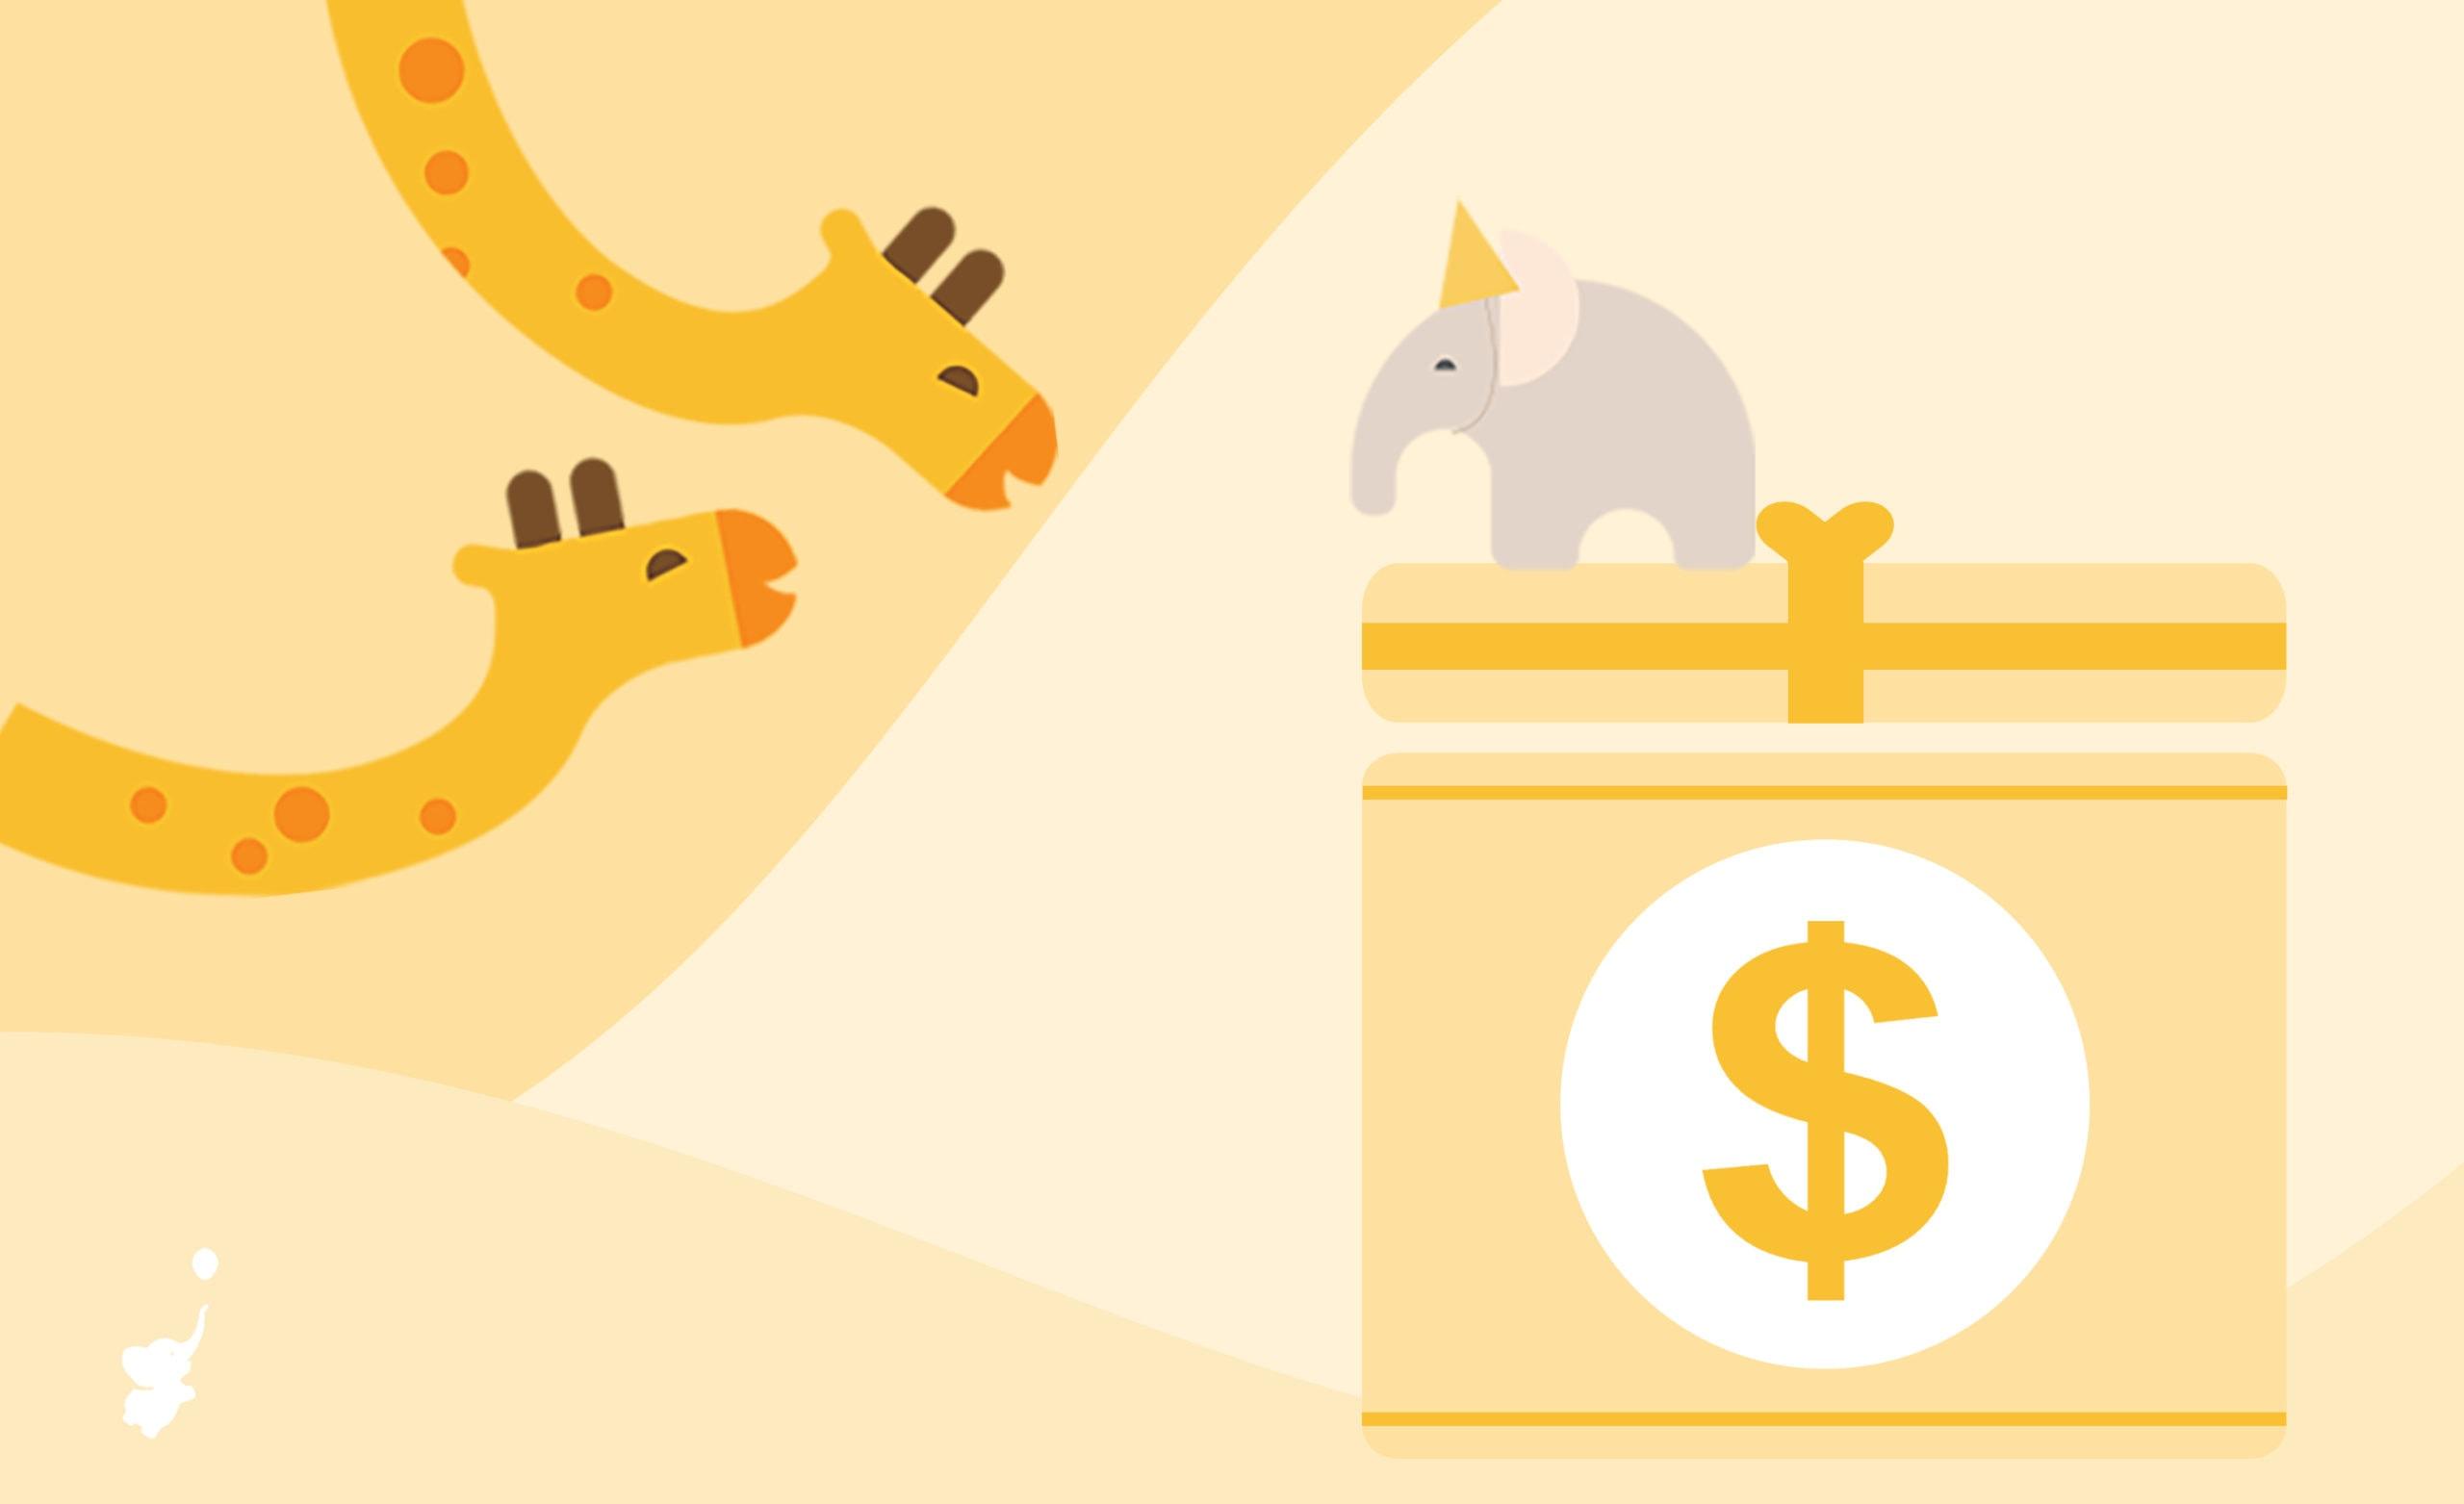 webbabyshower header image giraffe and elephant with big cash gift